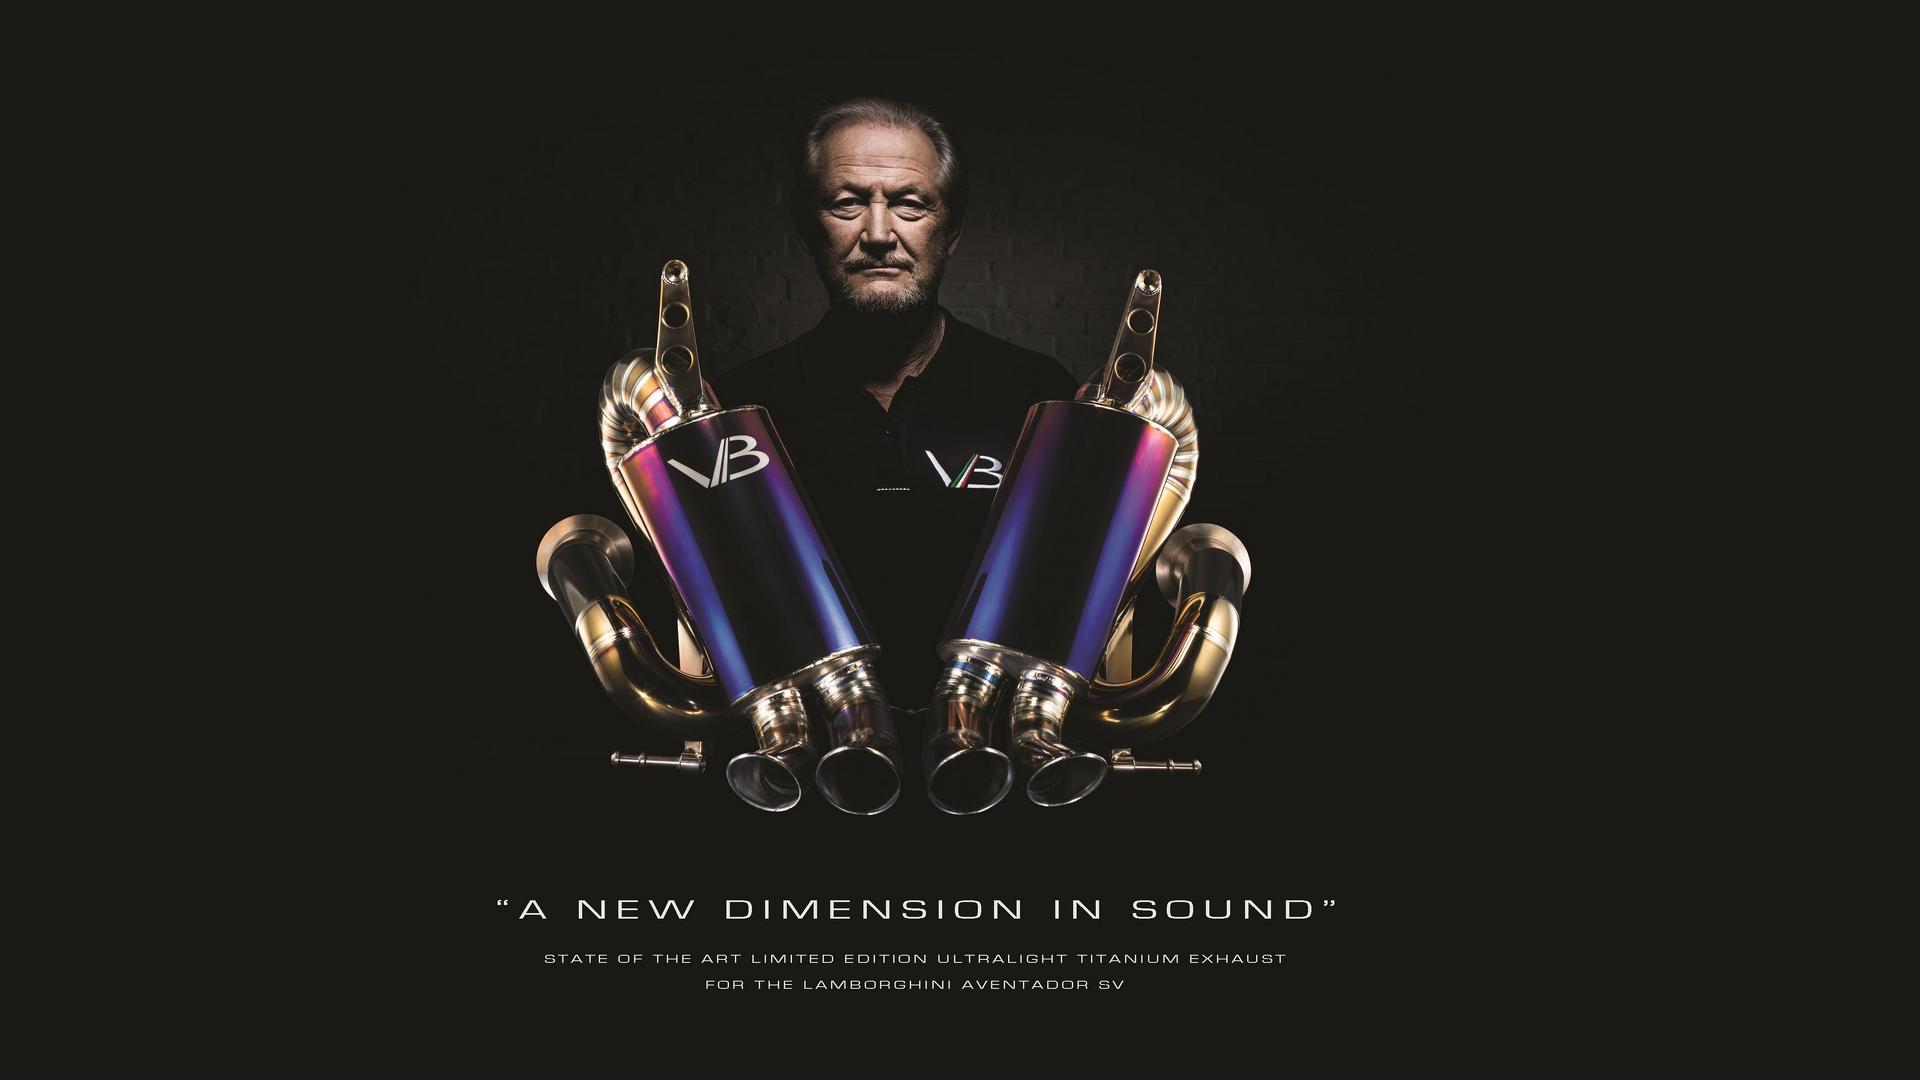 Valentino Balboni – yes, that VB – will start his own company to make Lamborghini tuning parts